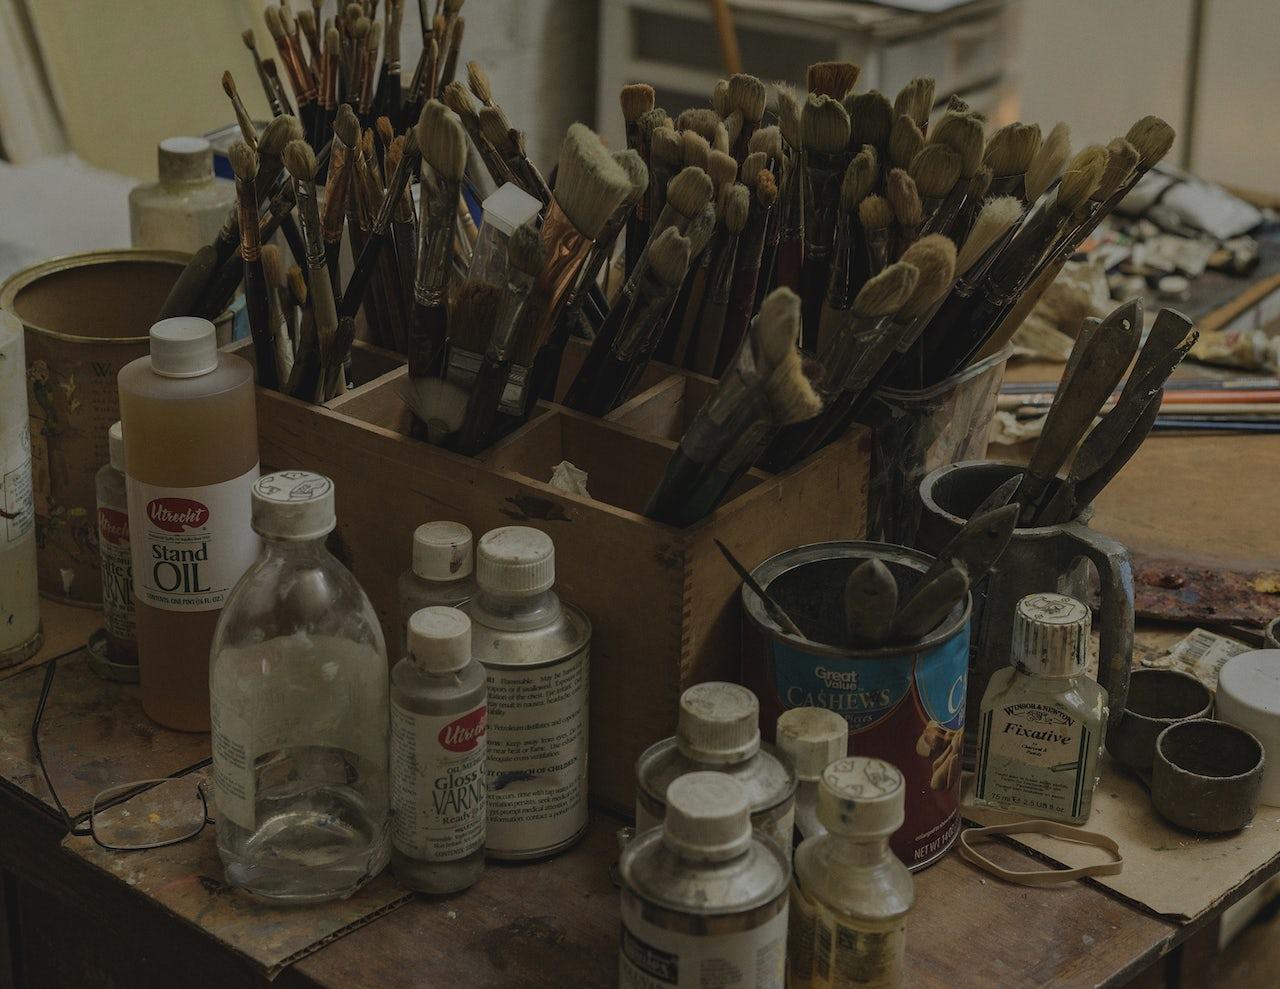 Paintbrushes in Burton Silverman's studio.